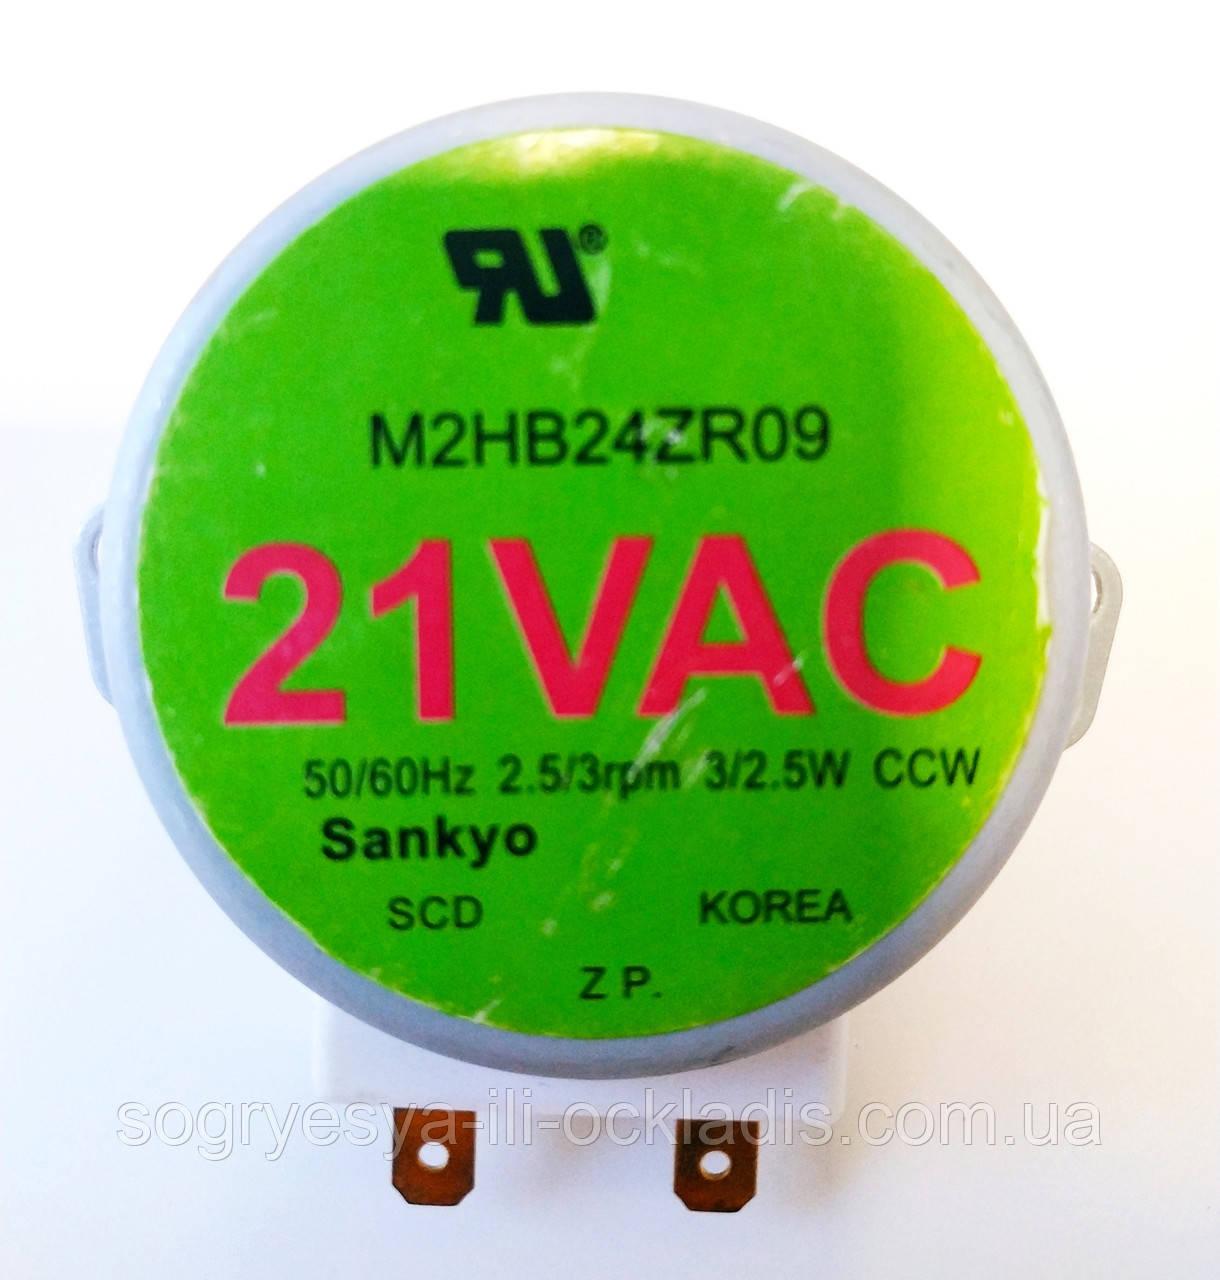 Двигатель микроволновой печи 21V/ 2.5/3rpm d=6х7mm L=16mm код товара: 7442